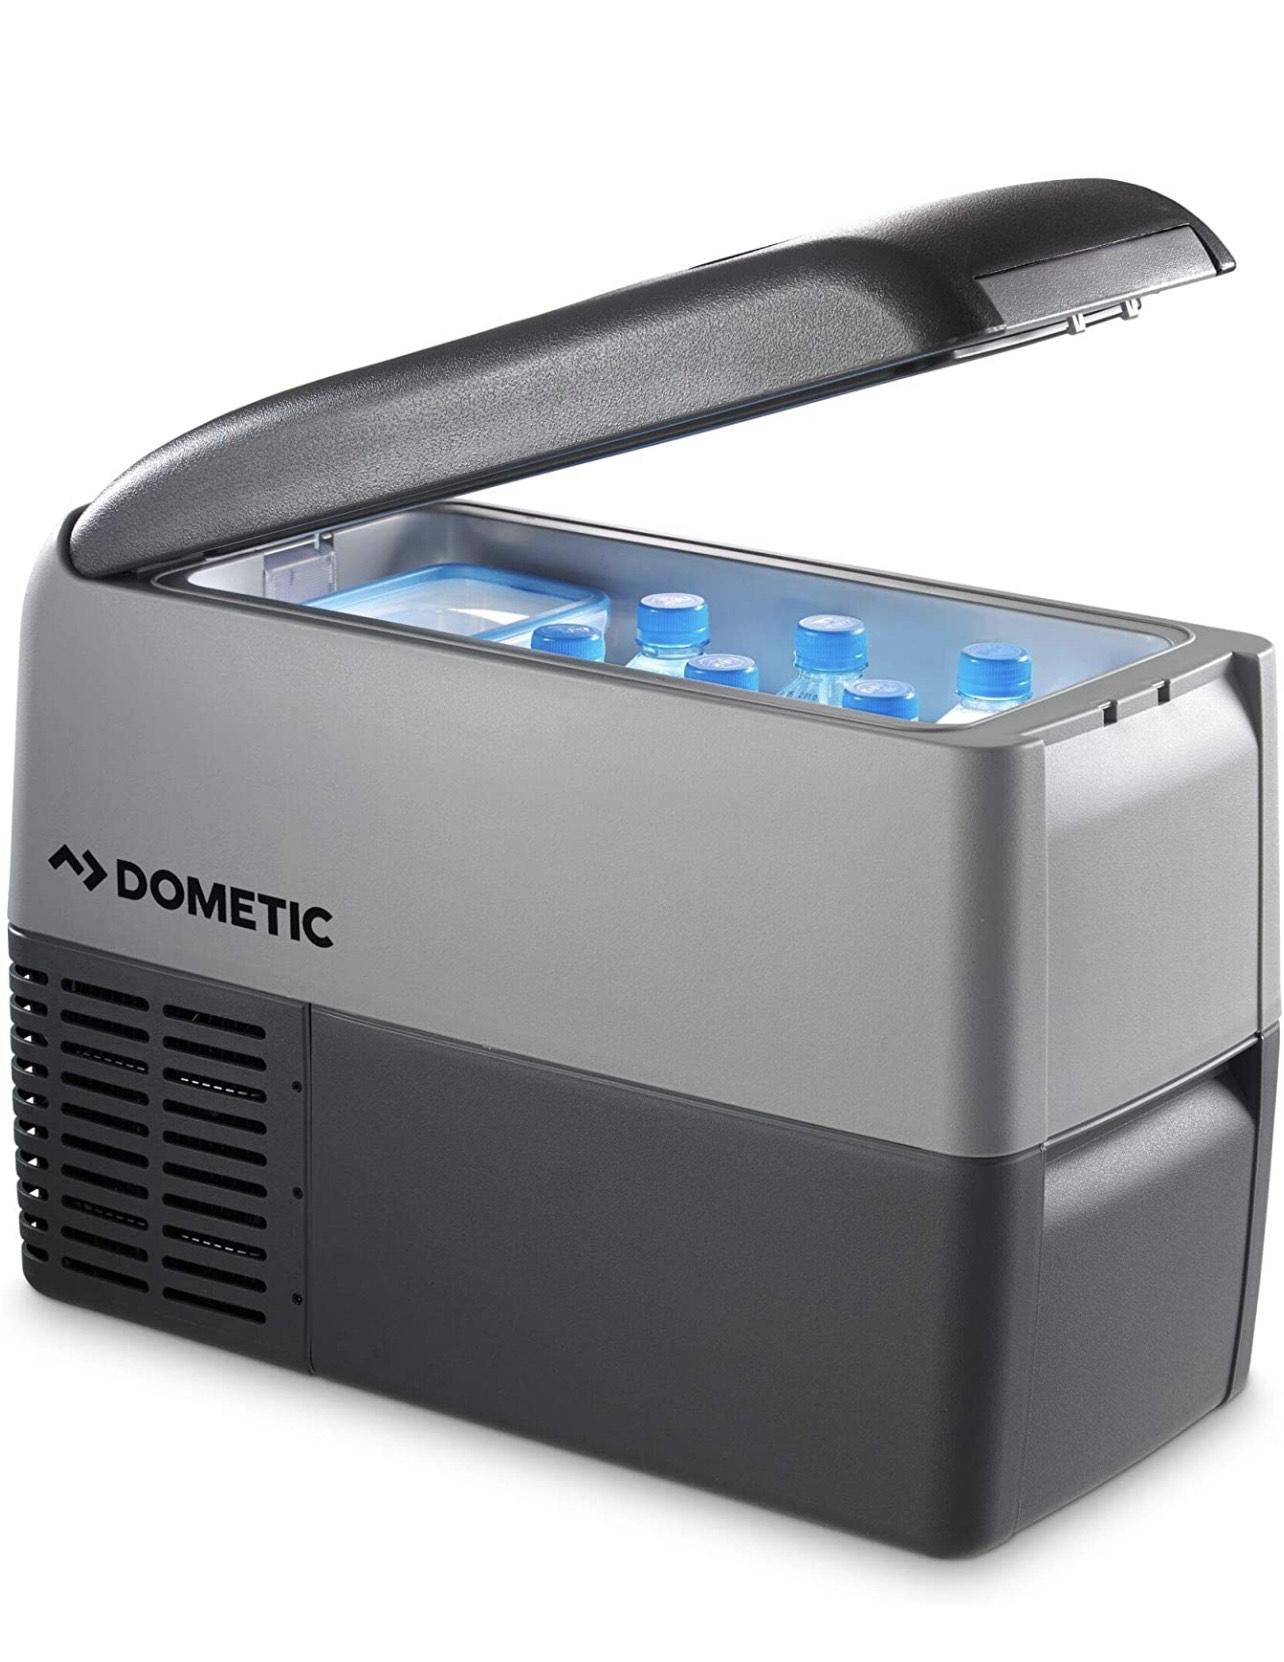 Dometic CDF 26 Kompressor Kühlbox